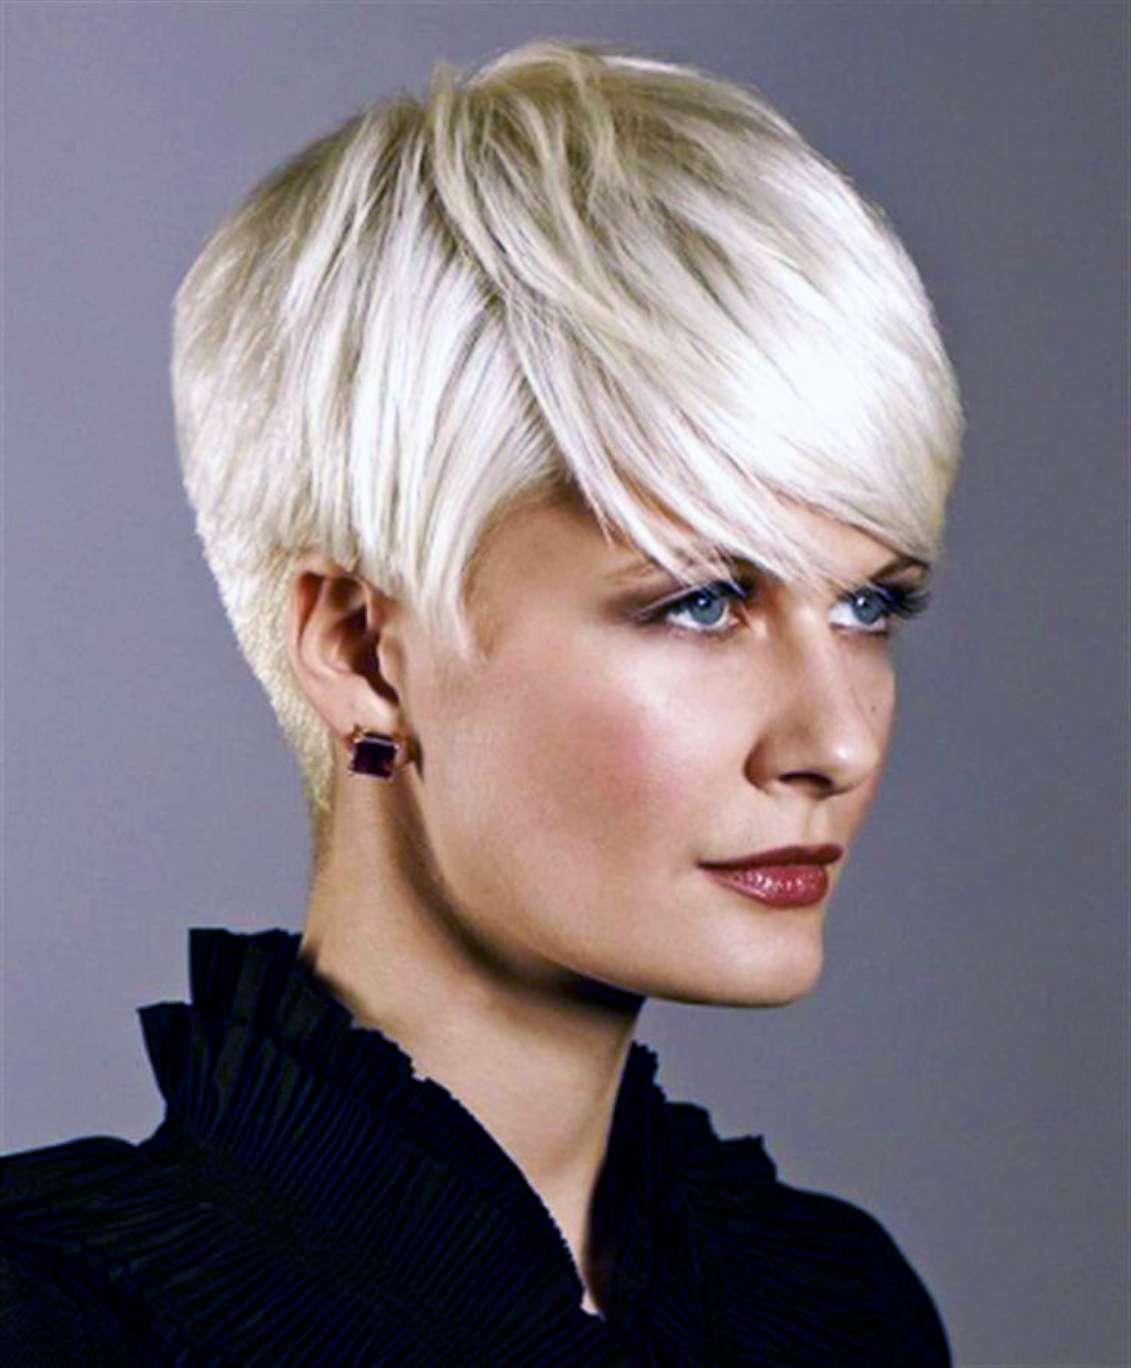 peinados-para-pelo-corto-2014-flequillo-rapado-detras